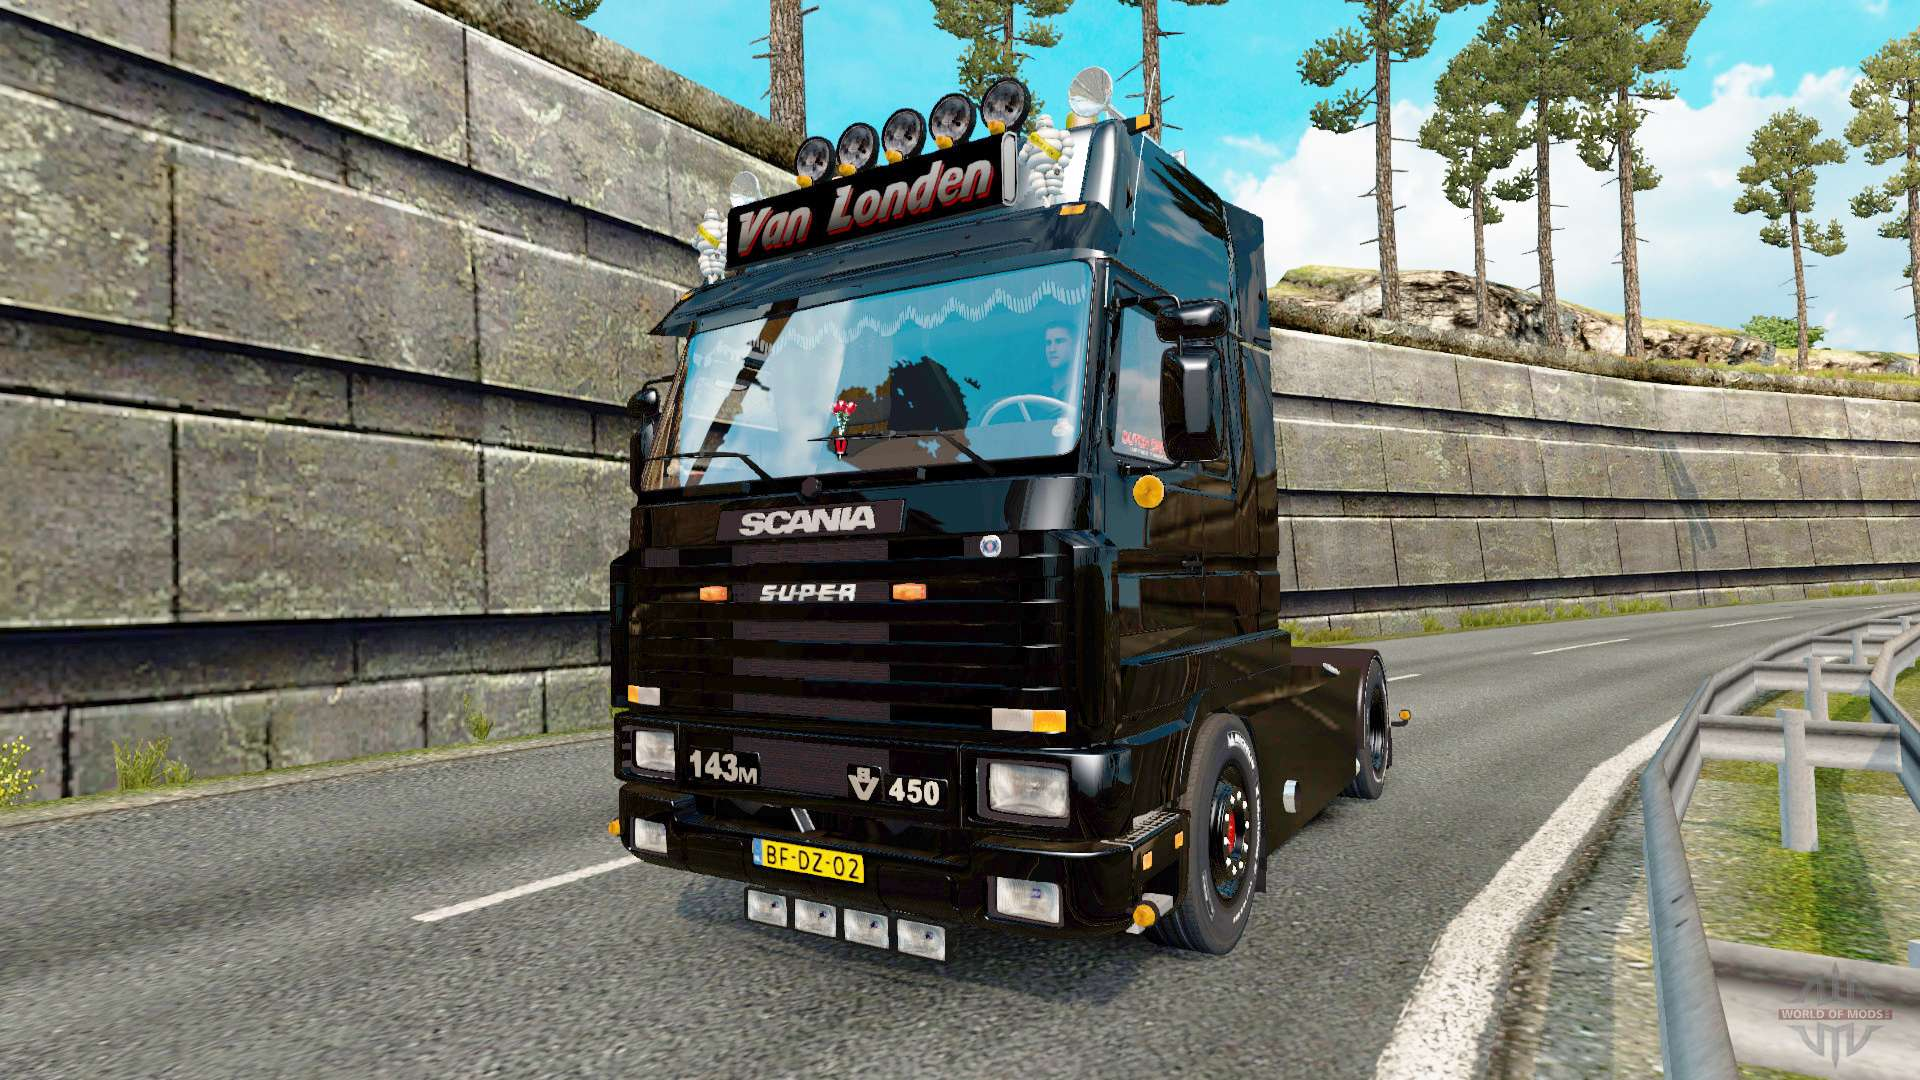 scania 143m 450 van londen for euro truck simulator 2. Black Bedroom Furniture Sets. Home Design Ideas